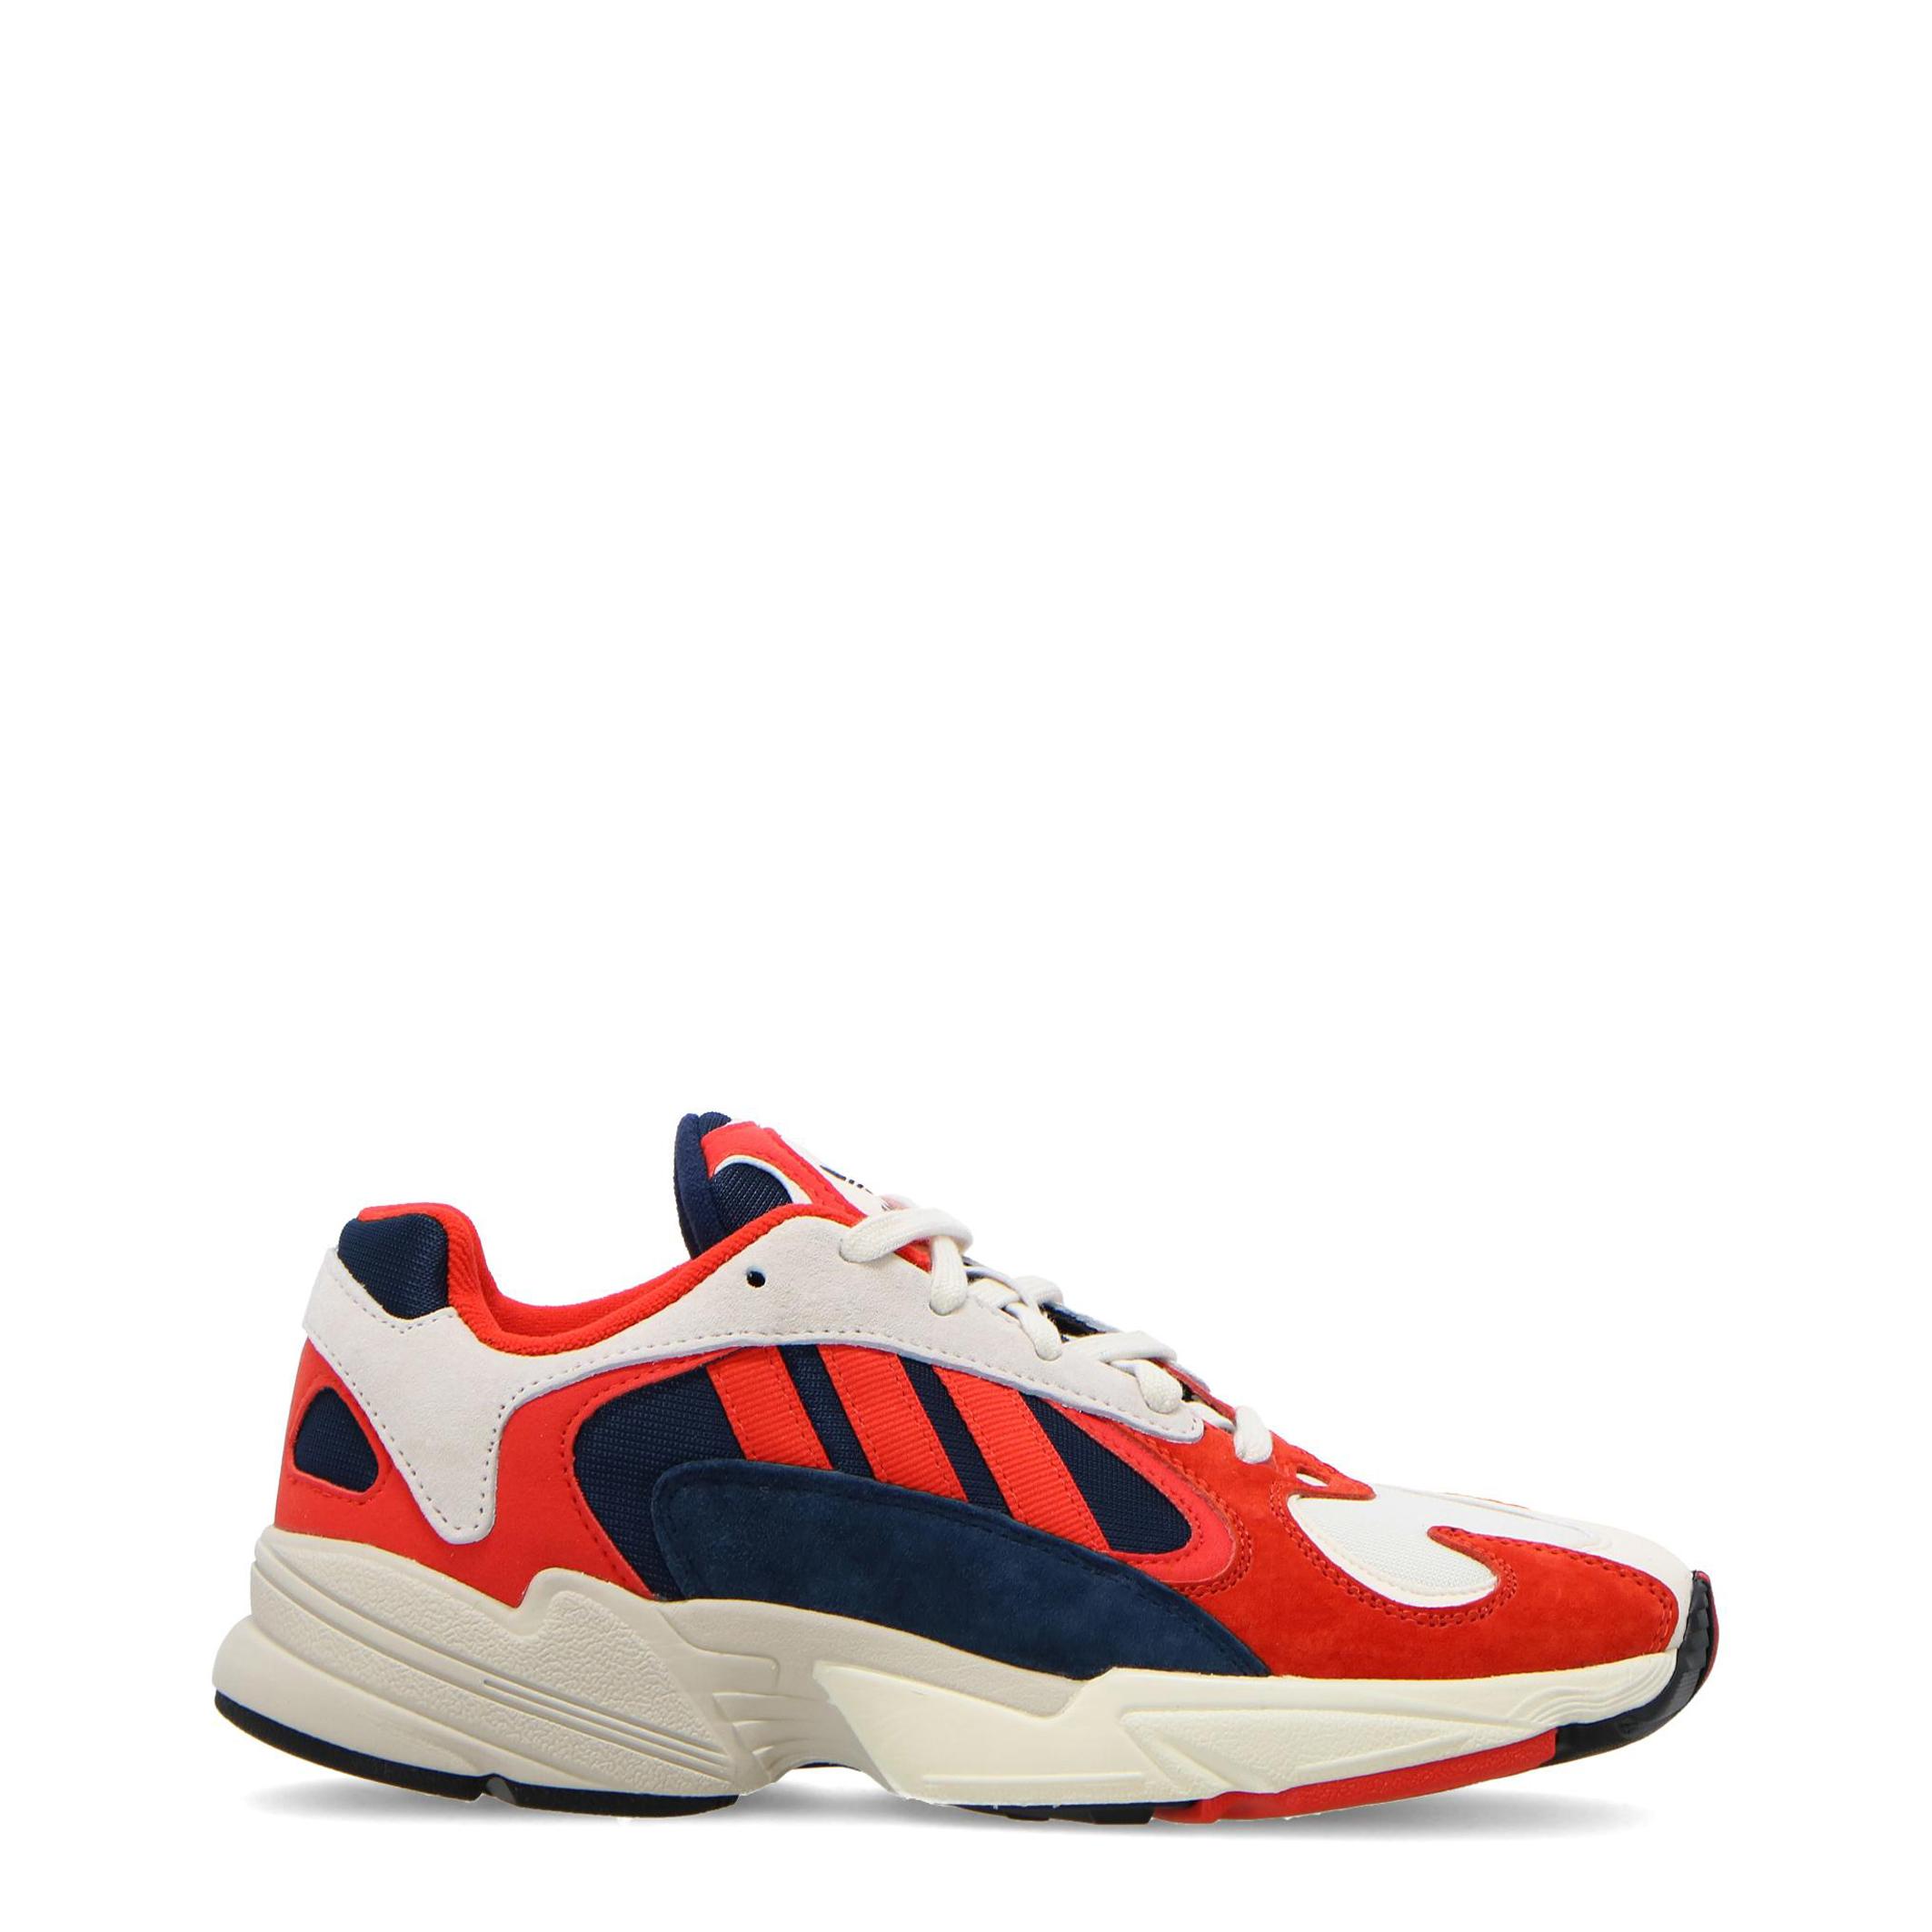 9927 Adidas Yung-1 Uomo Rosso 104264 Adidas